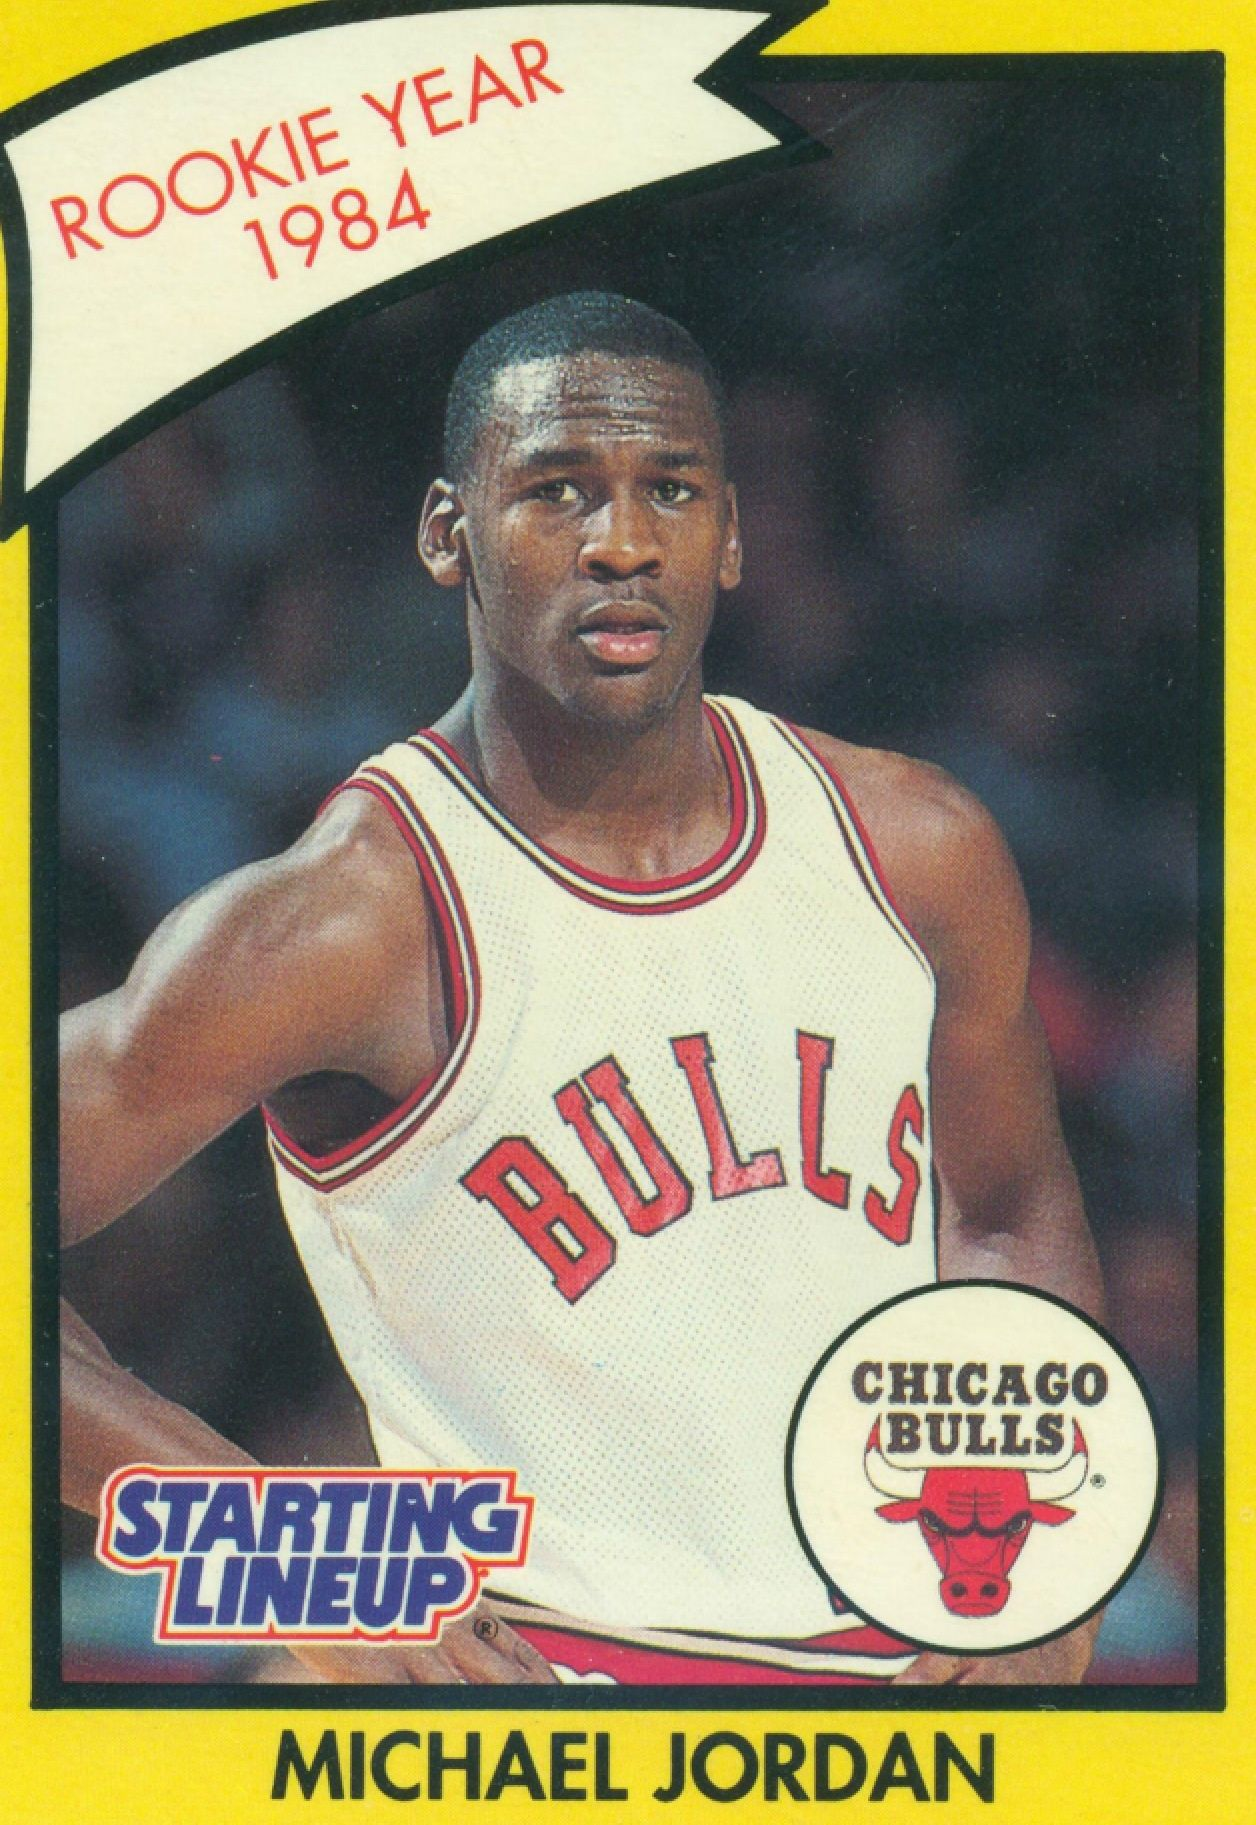 Best 25 Michael Jordan Rookie Year Ideas On Pinterest